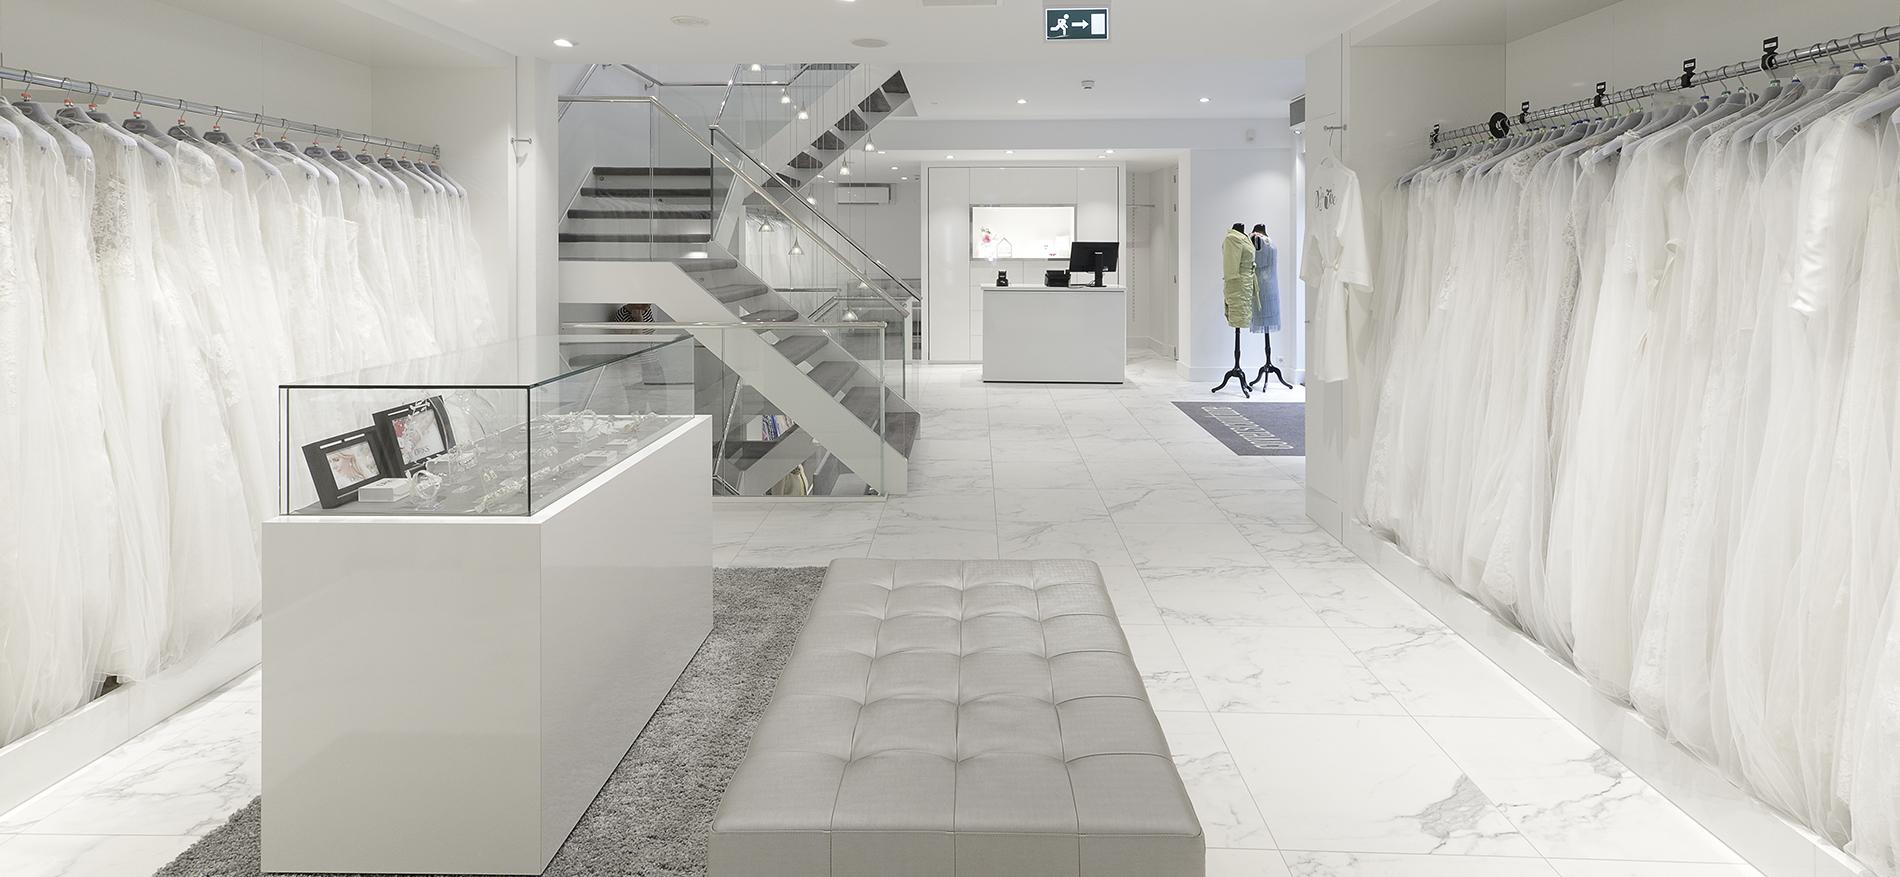 Covers Couture Utrecht Bridal Shop Interior